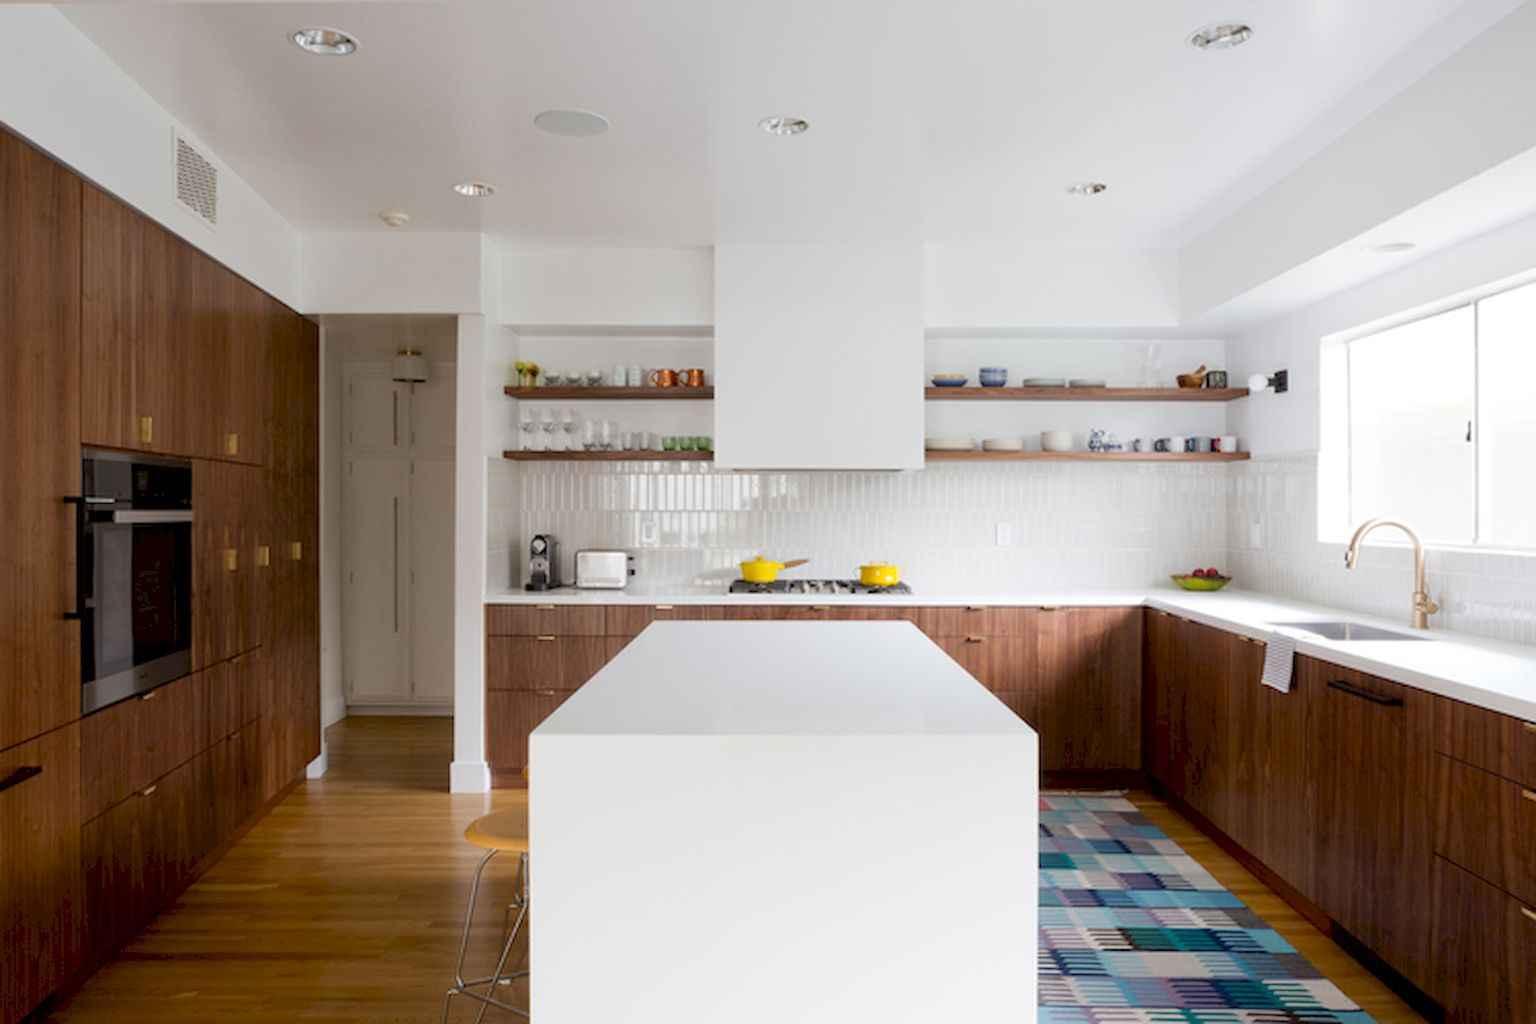 Mid century modern kitchen design ideas (17)